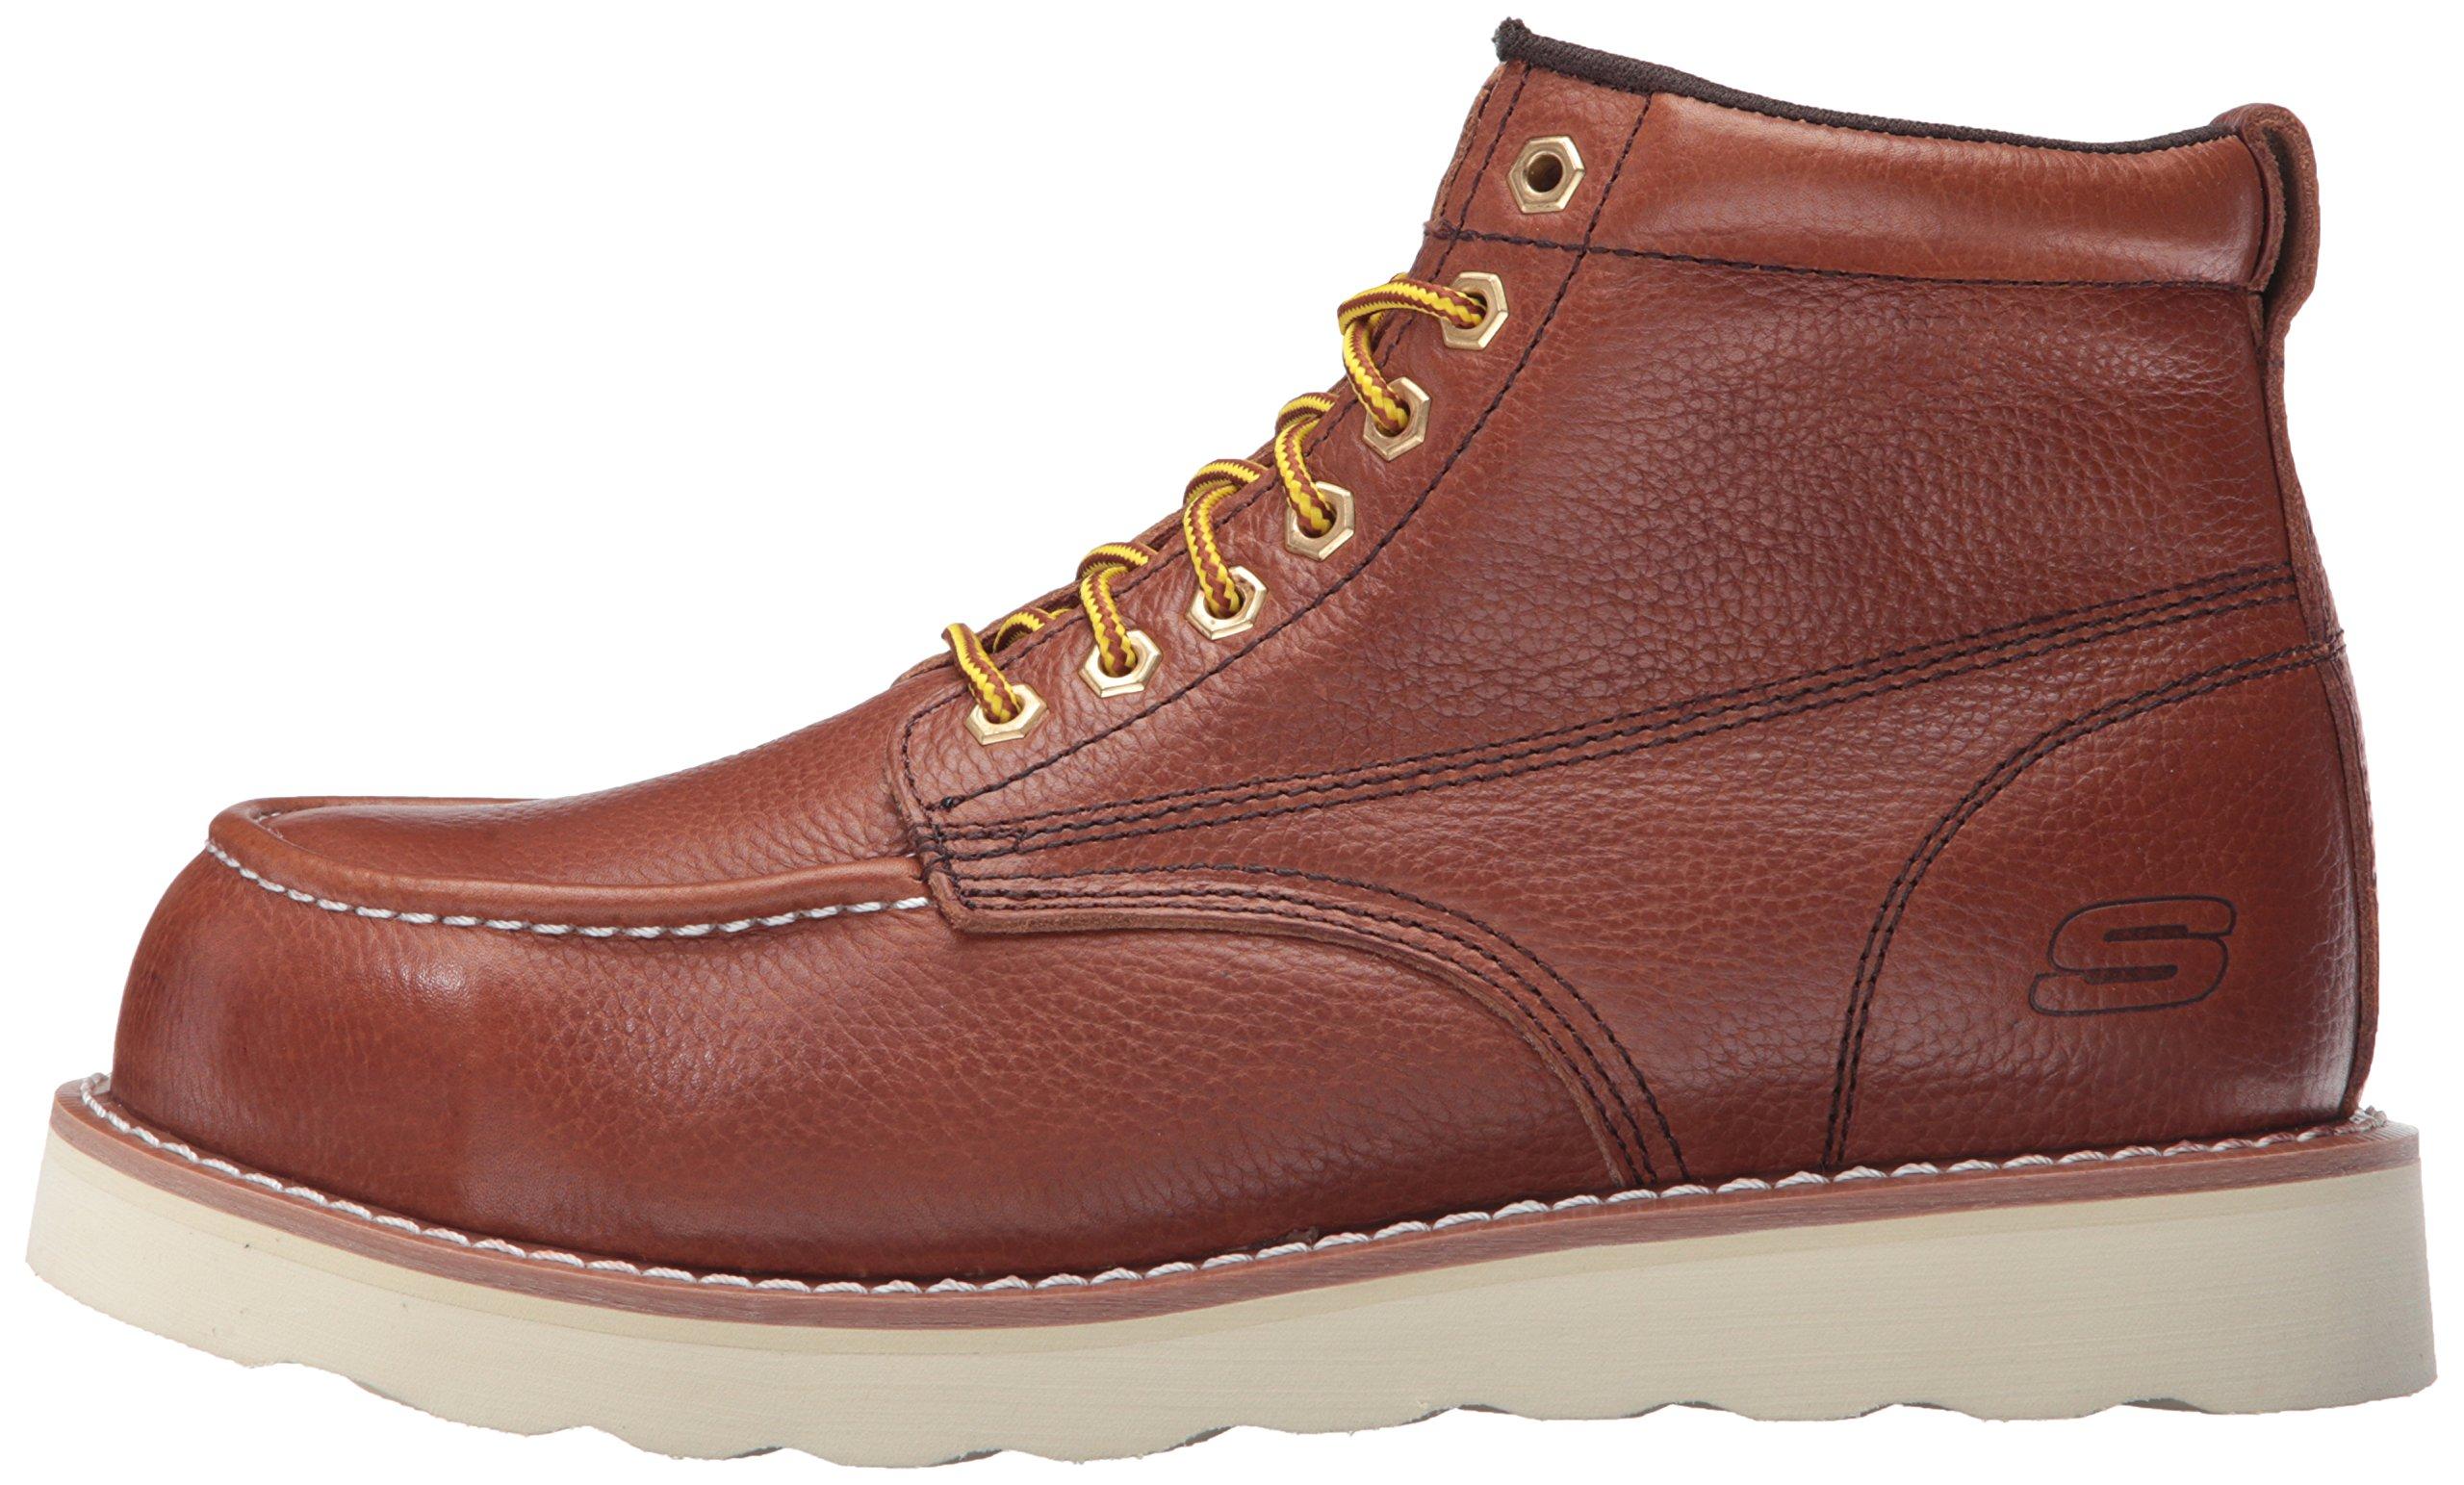 Skechers for Work Men's Pettus Grafford Work Boot,Red Brown,10.5 M US by Skechers (Image #5)